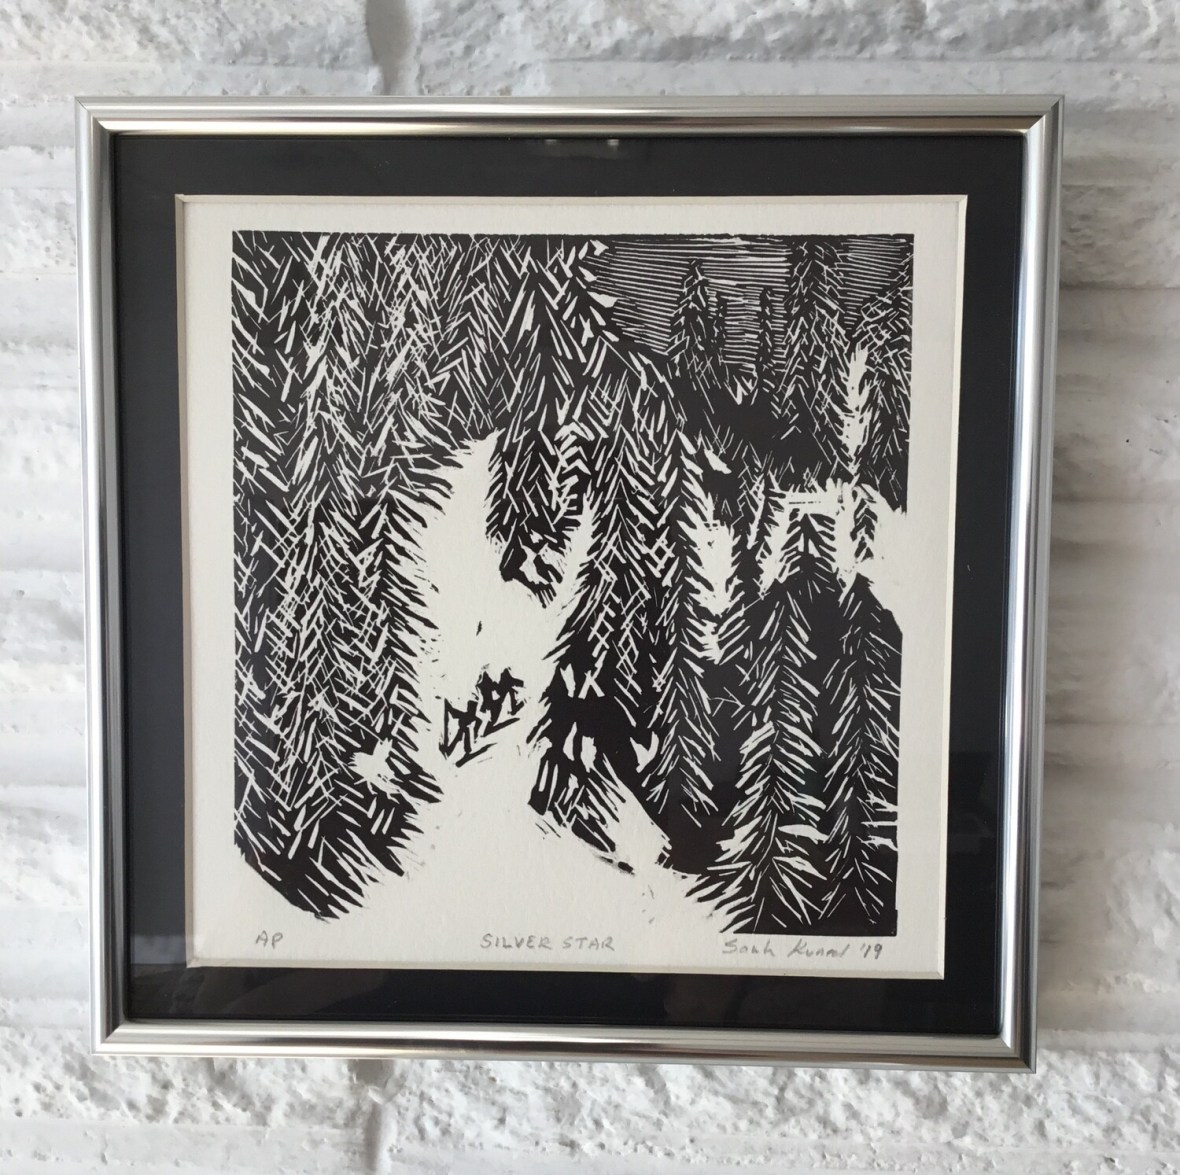 Silver Star (Linoleum Cut Print) by Sarah Konrad